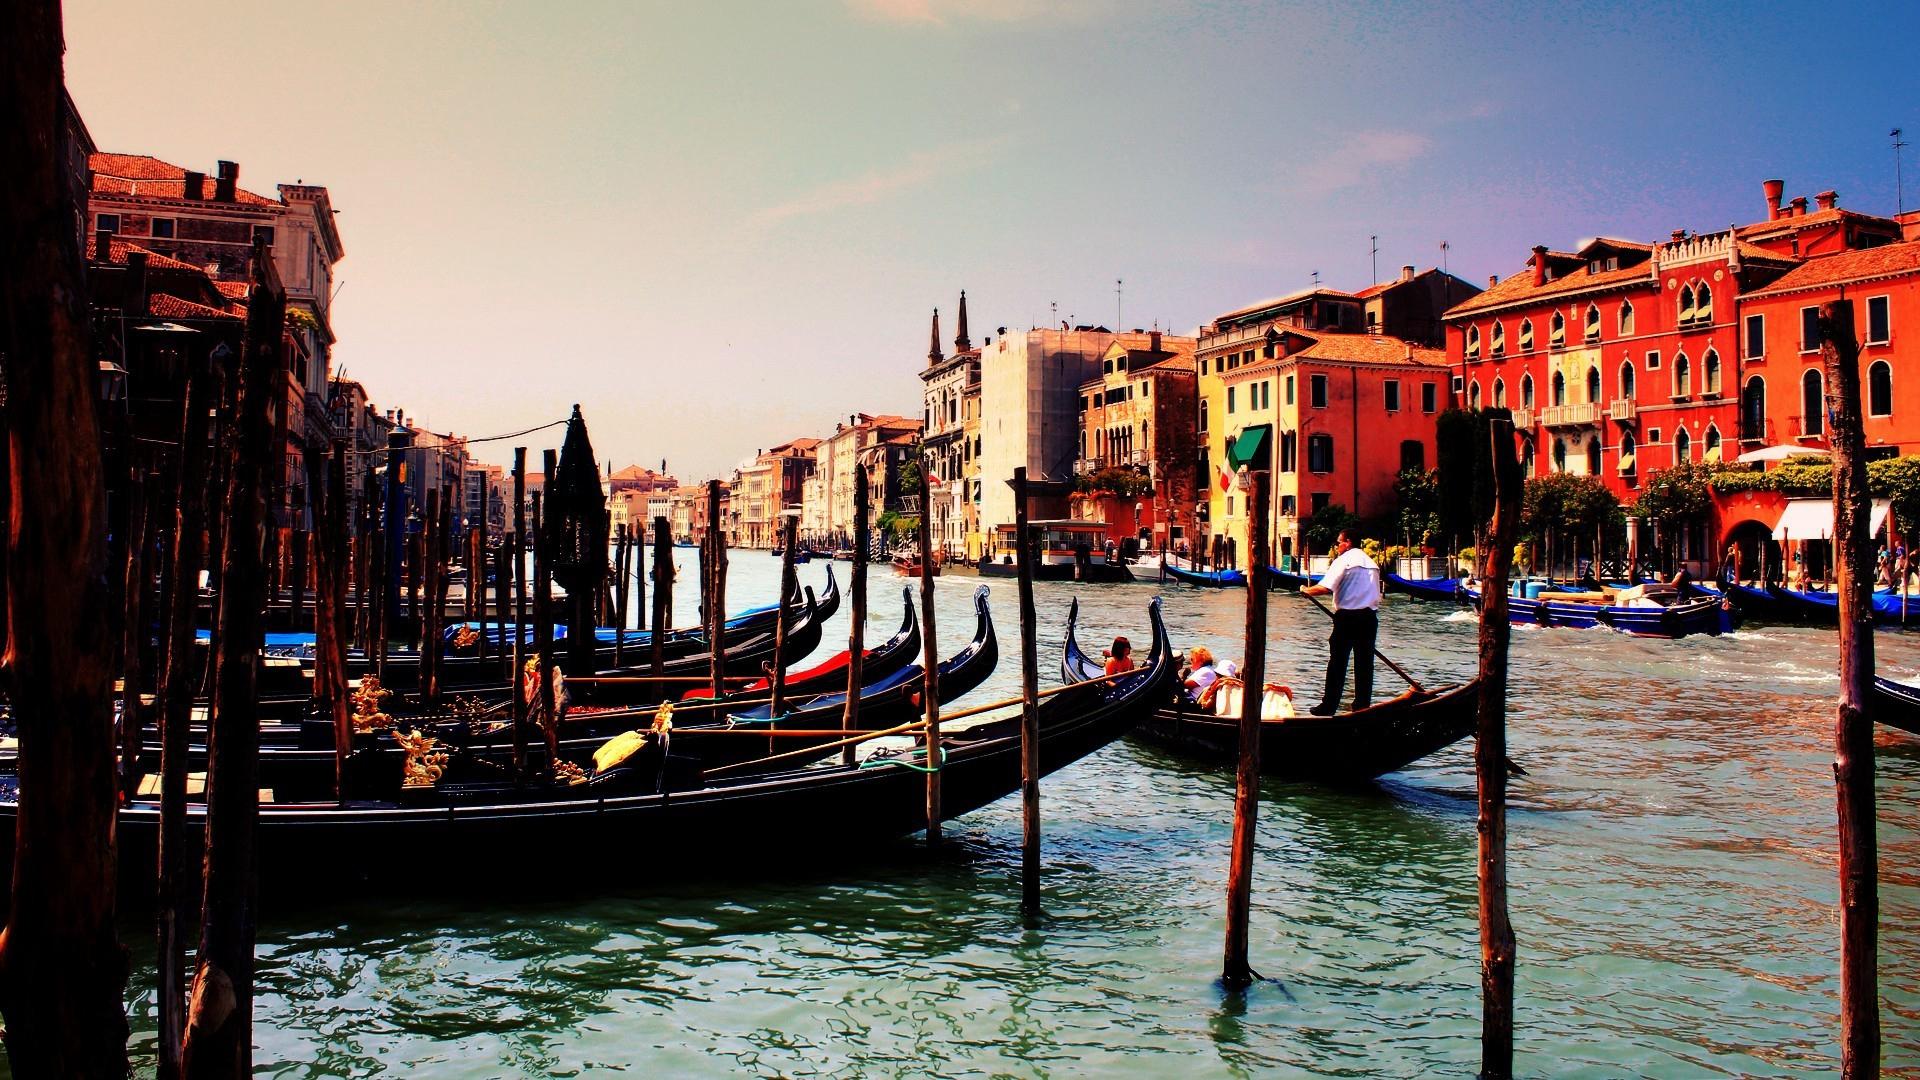 Venice Italy Gondola River   Stock Photos Images HD 1920x1080